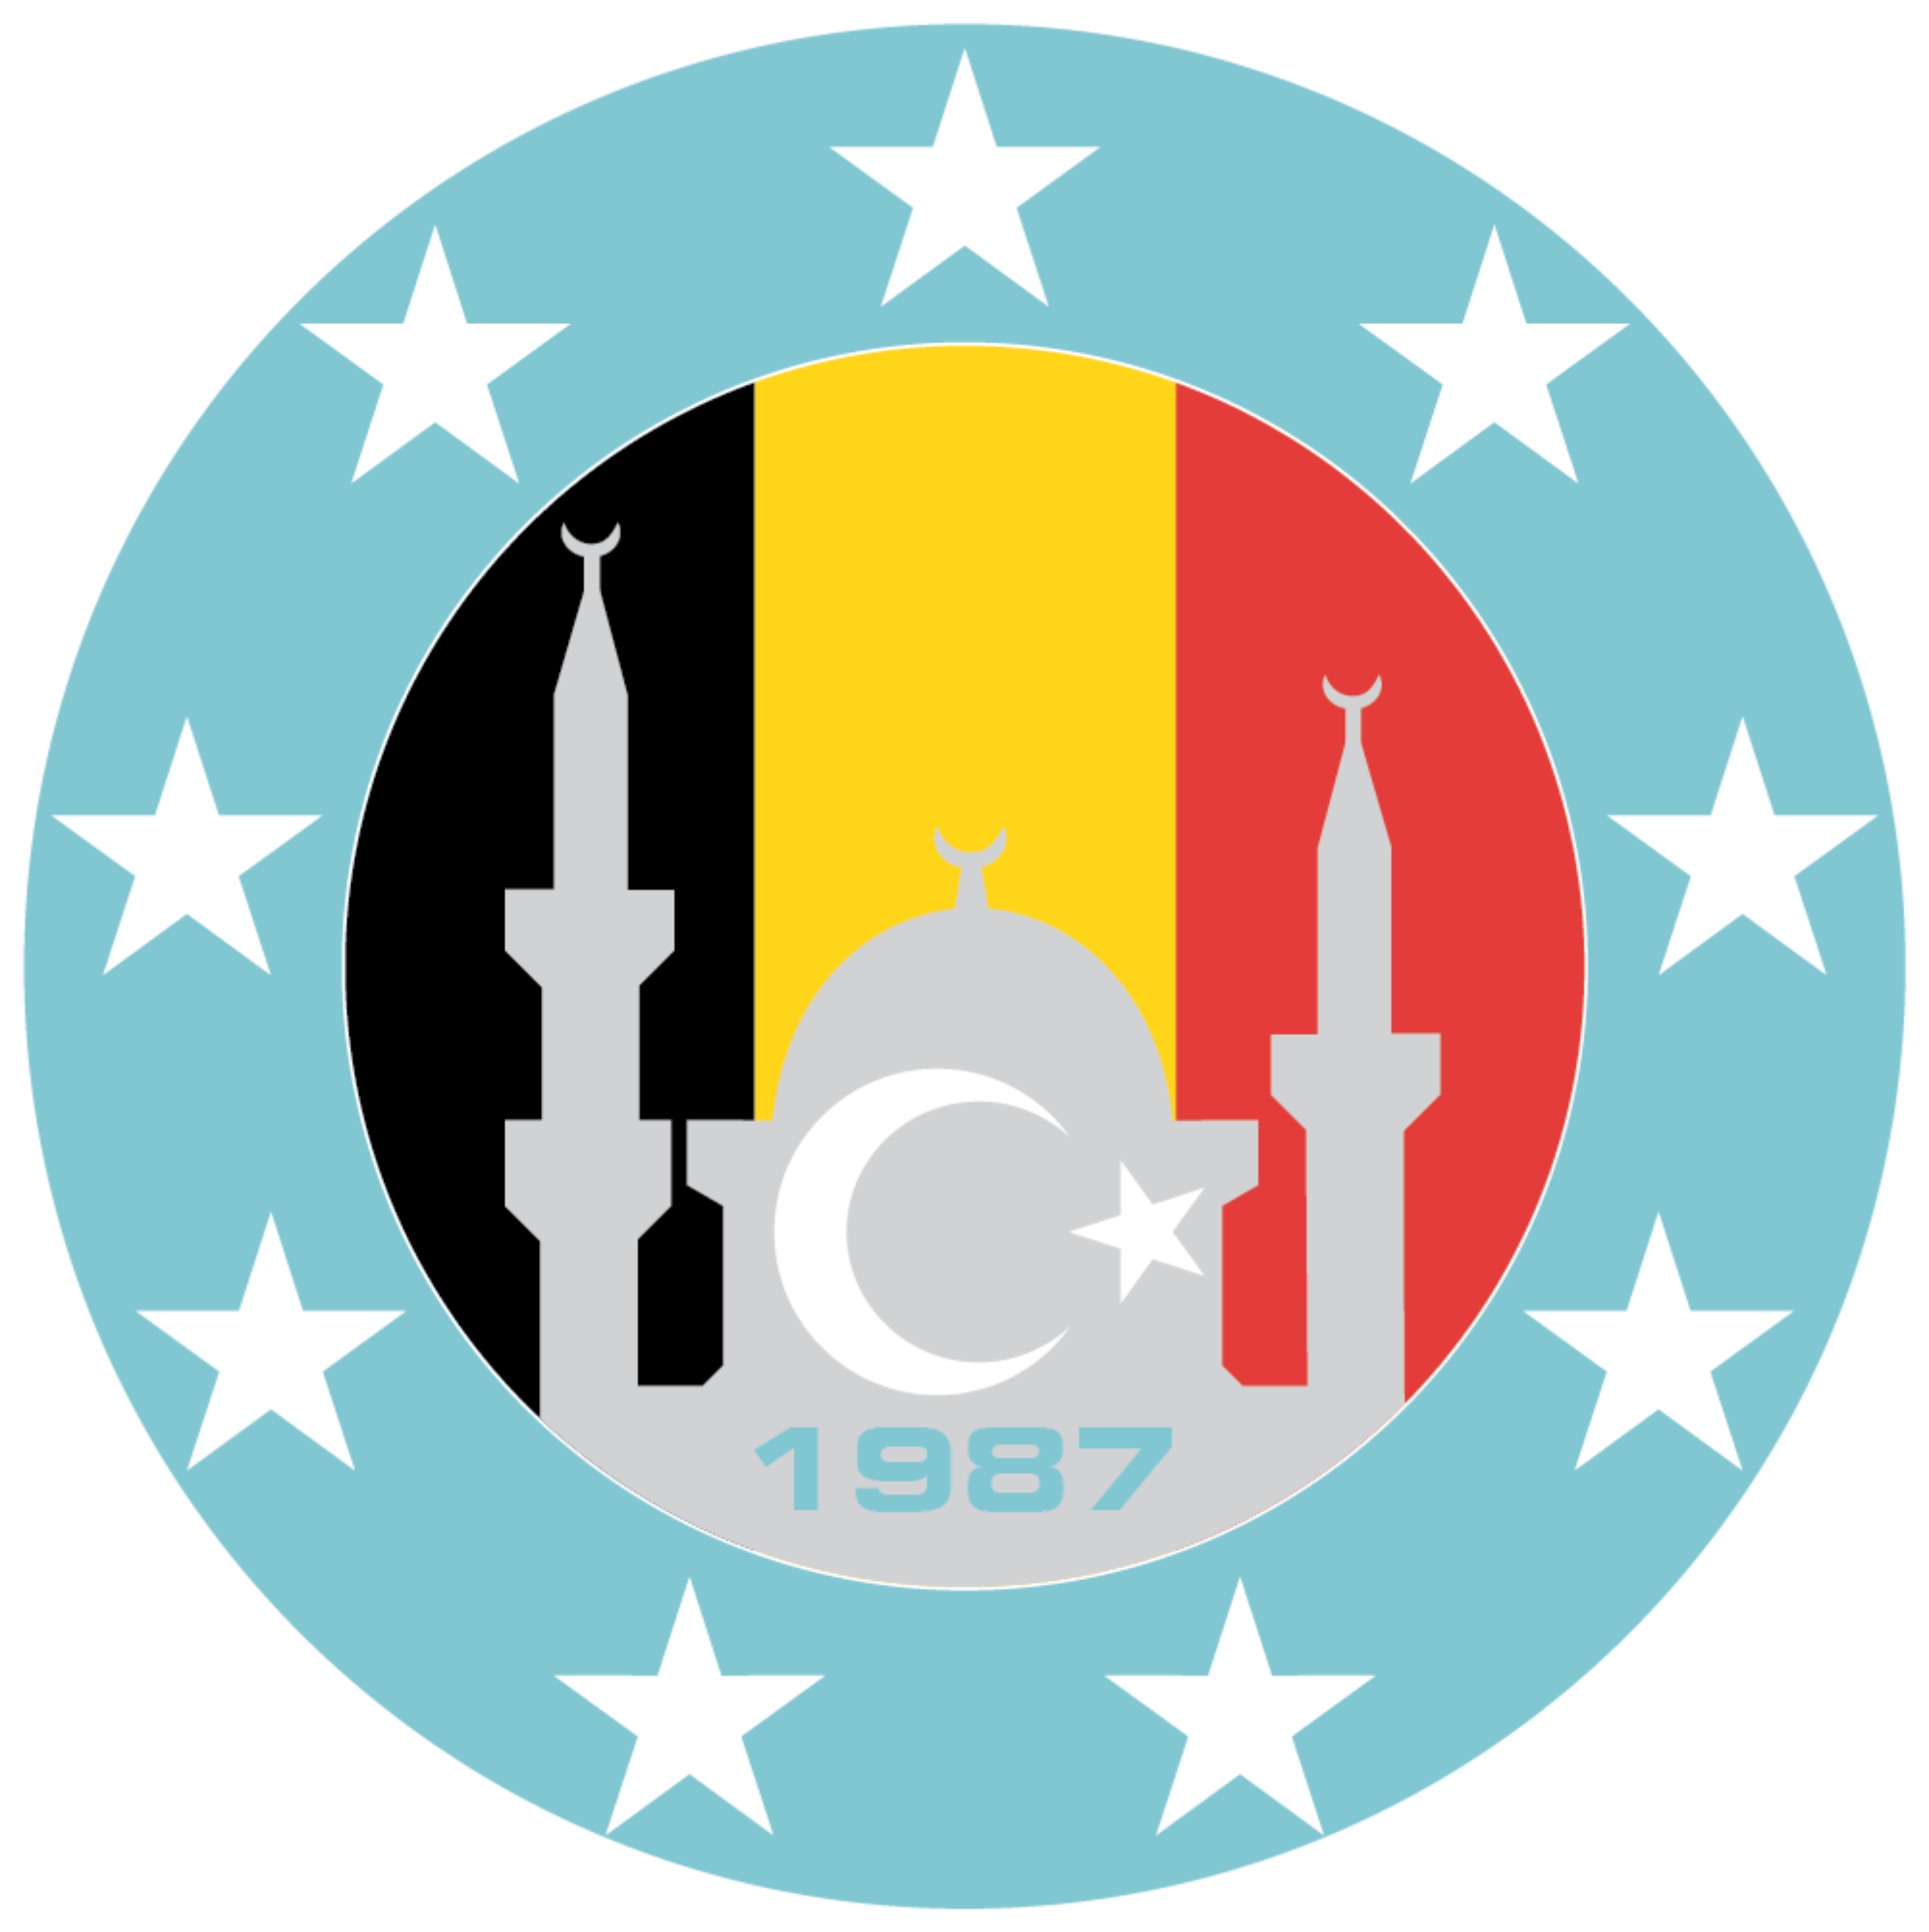 Belçika Türk Federasyon